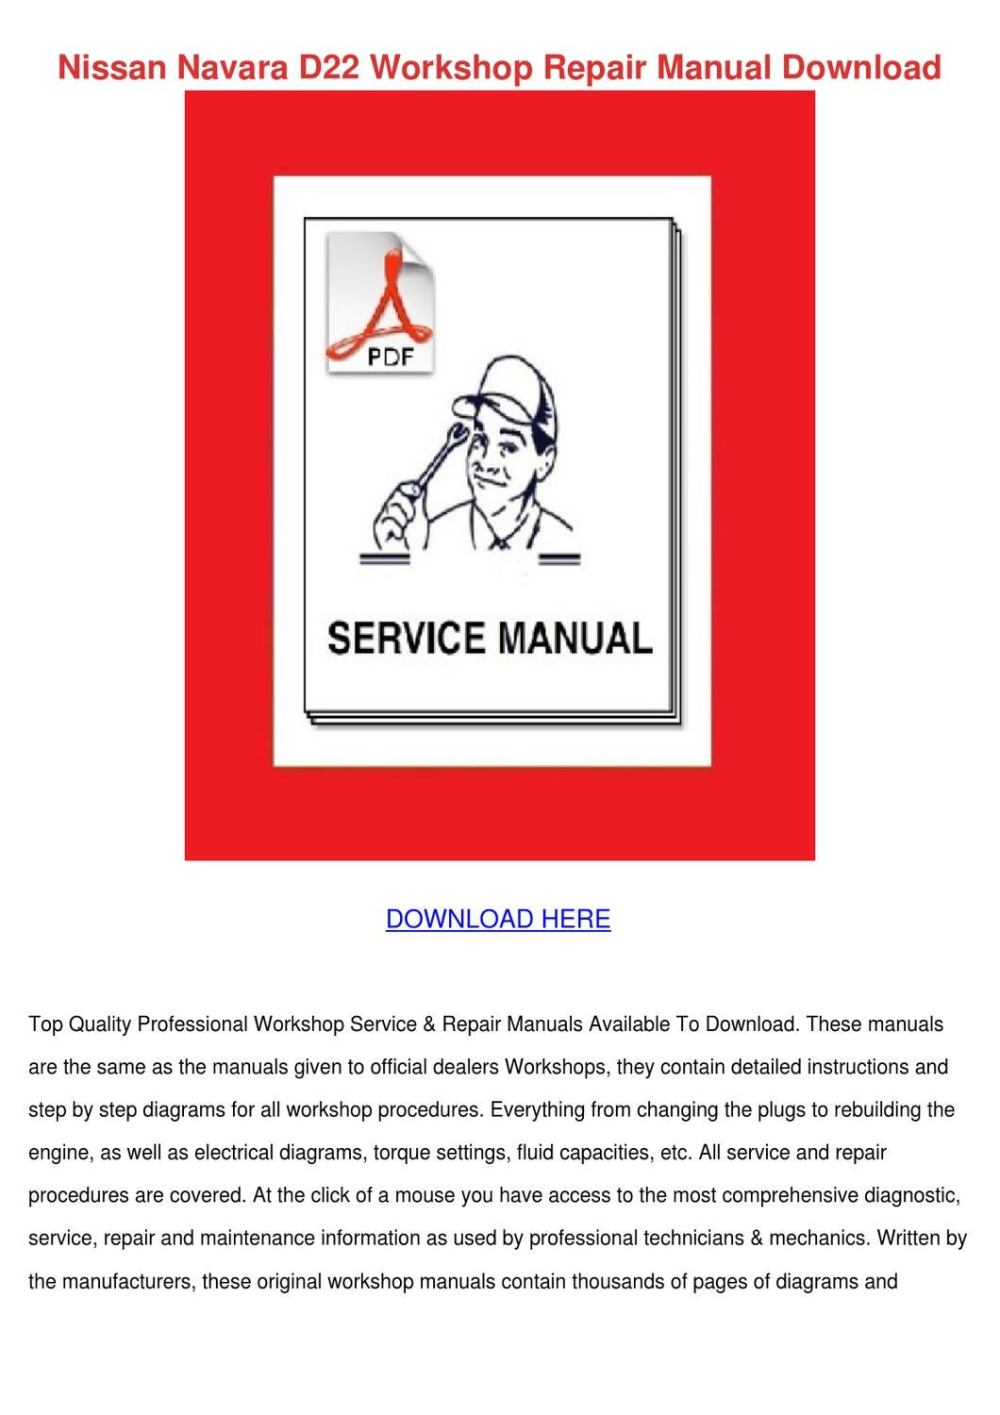 medium resolution of nissan navara d22 workshop repair manual down by letha barreneche issuu